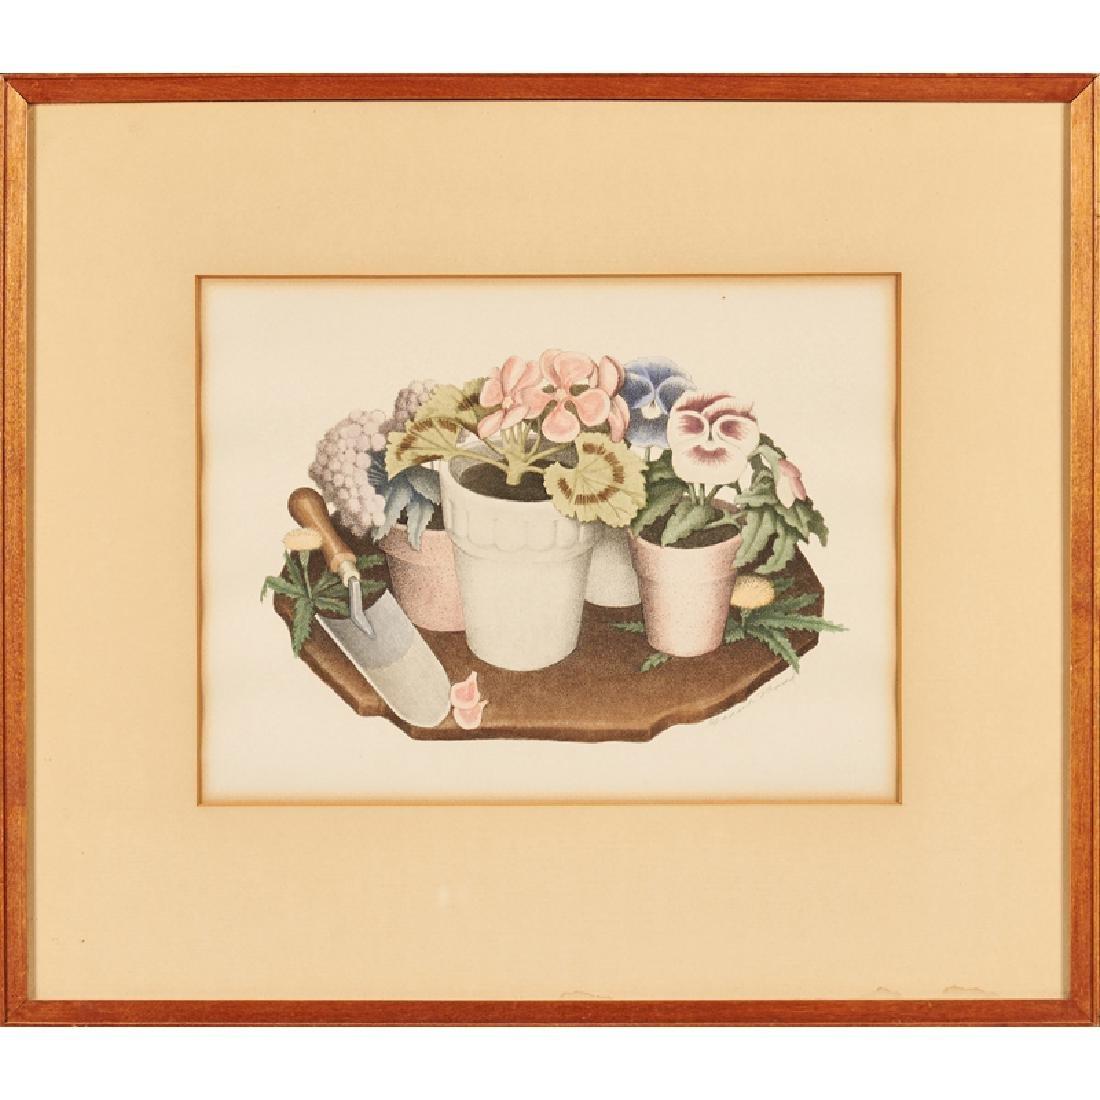 GRANT WOOD (American, 1891-1942)